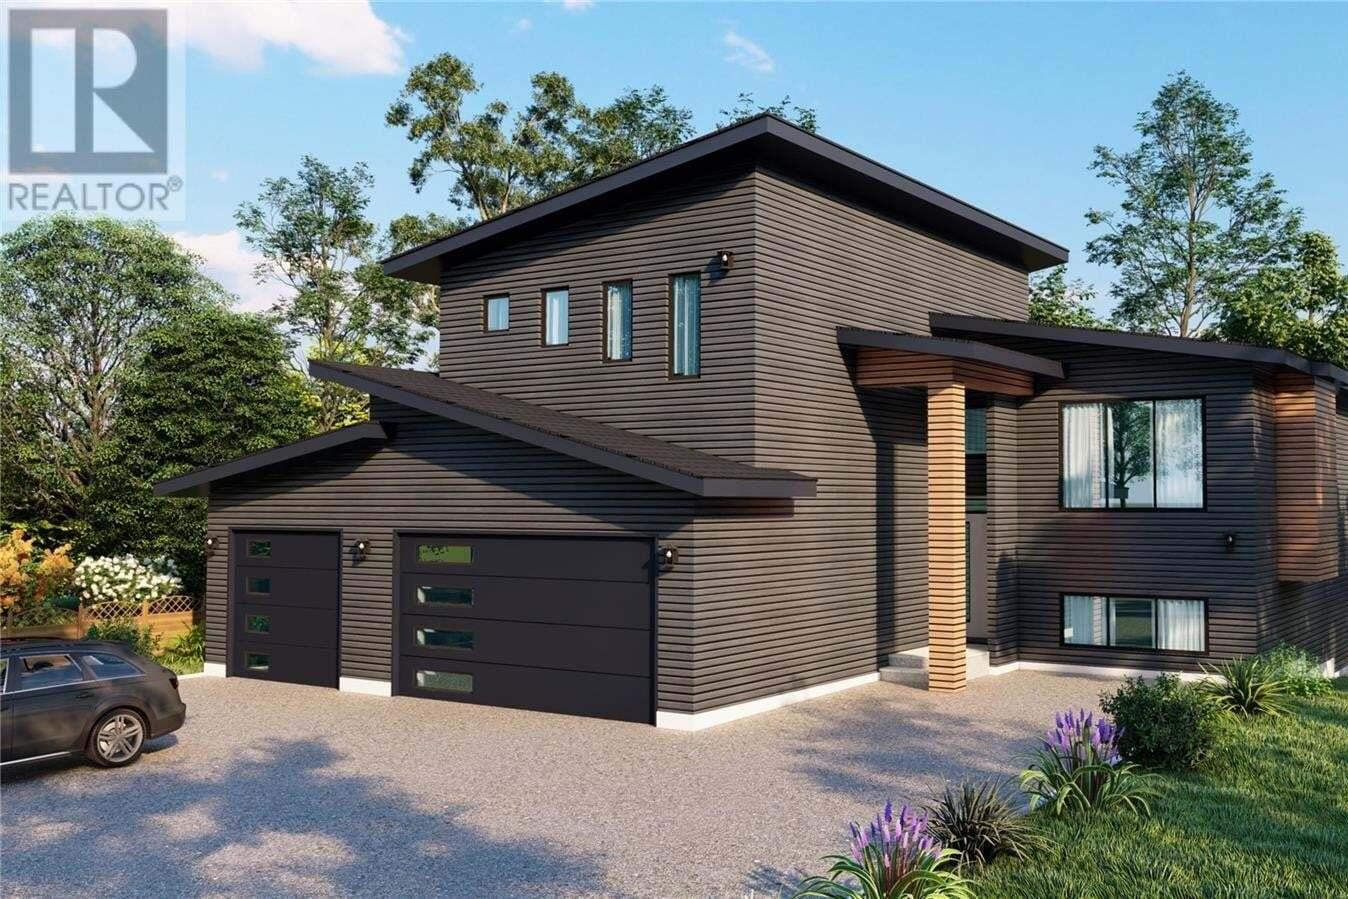 House for sale at 92 Rider Pl Dundurn Rm No. 314 Saskatchewan - MLS: SK818125